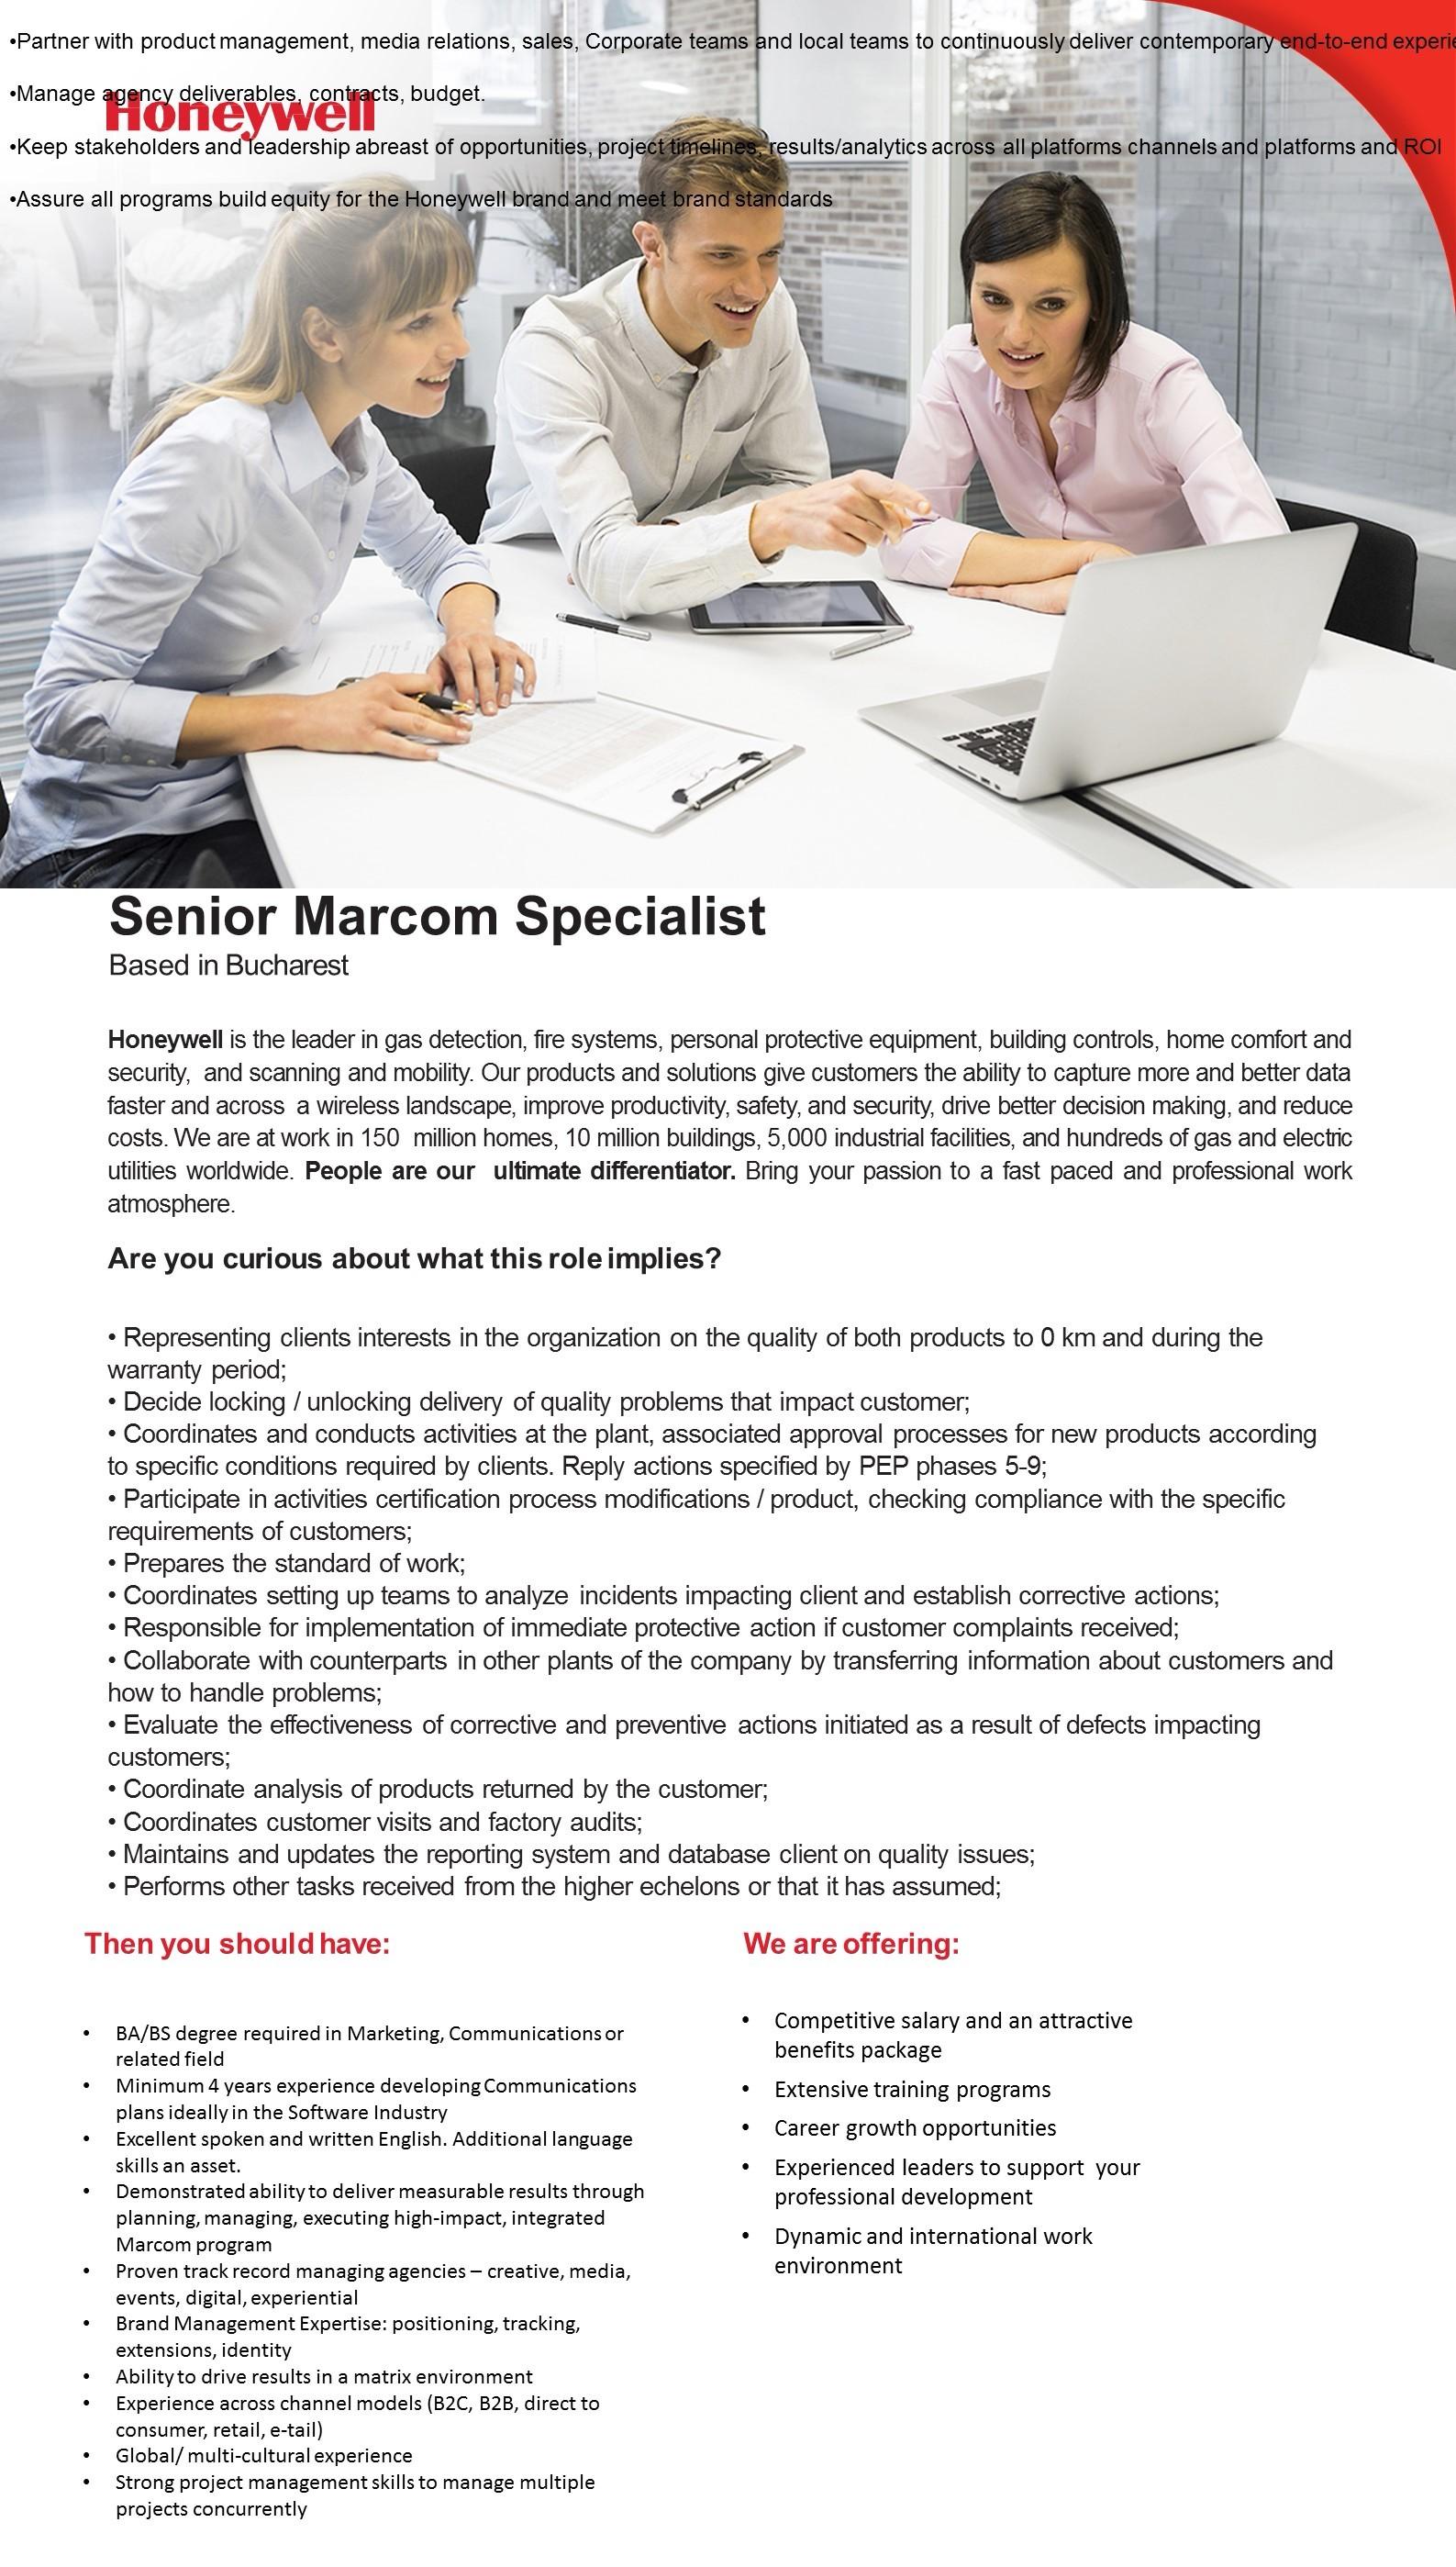 Senior marcom specialist